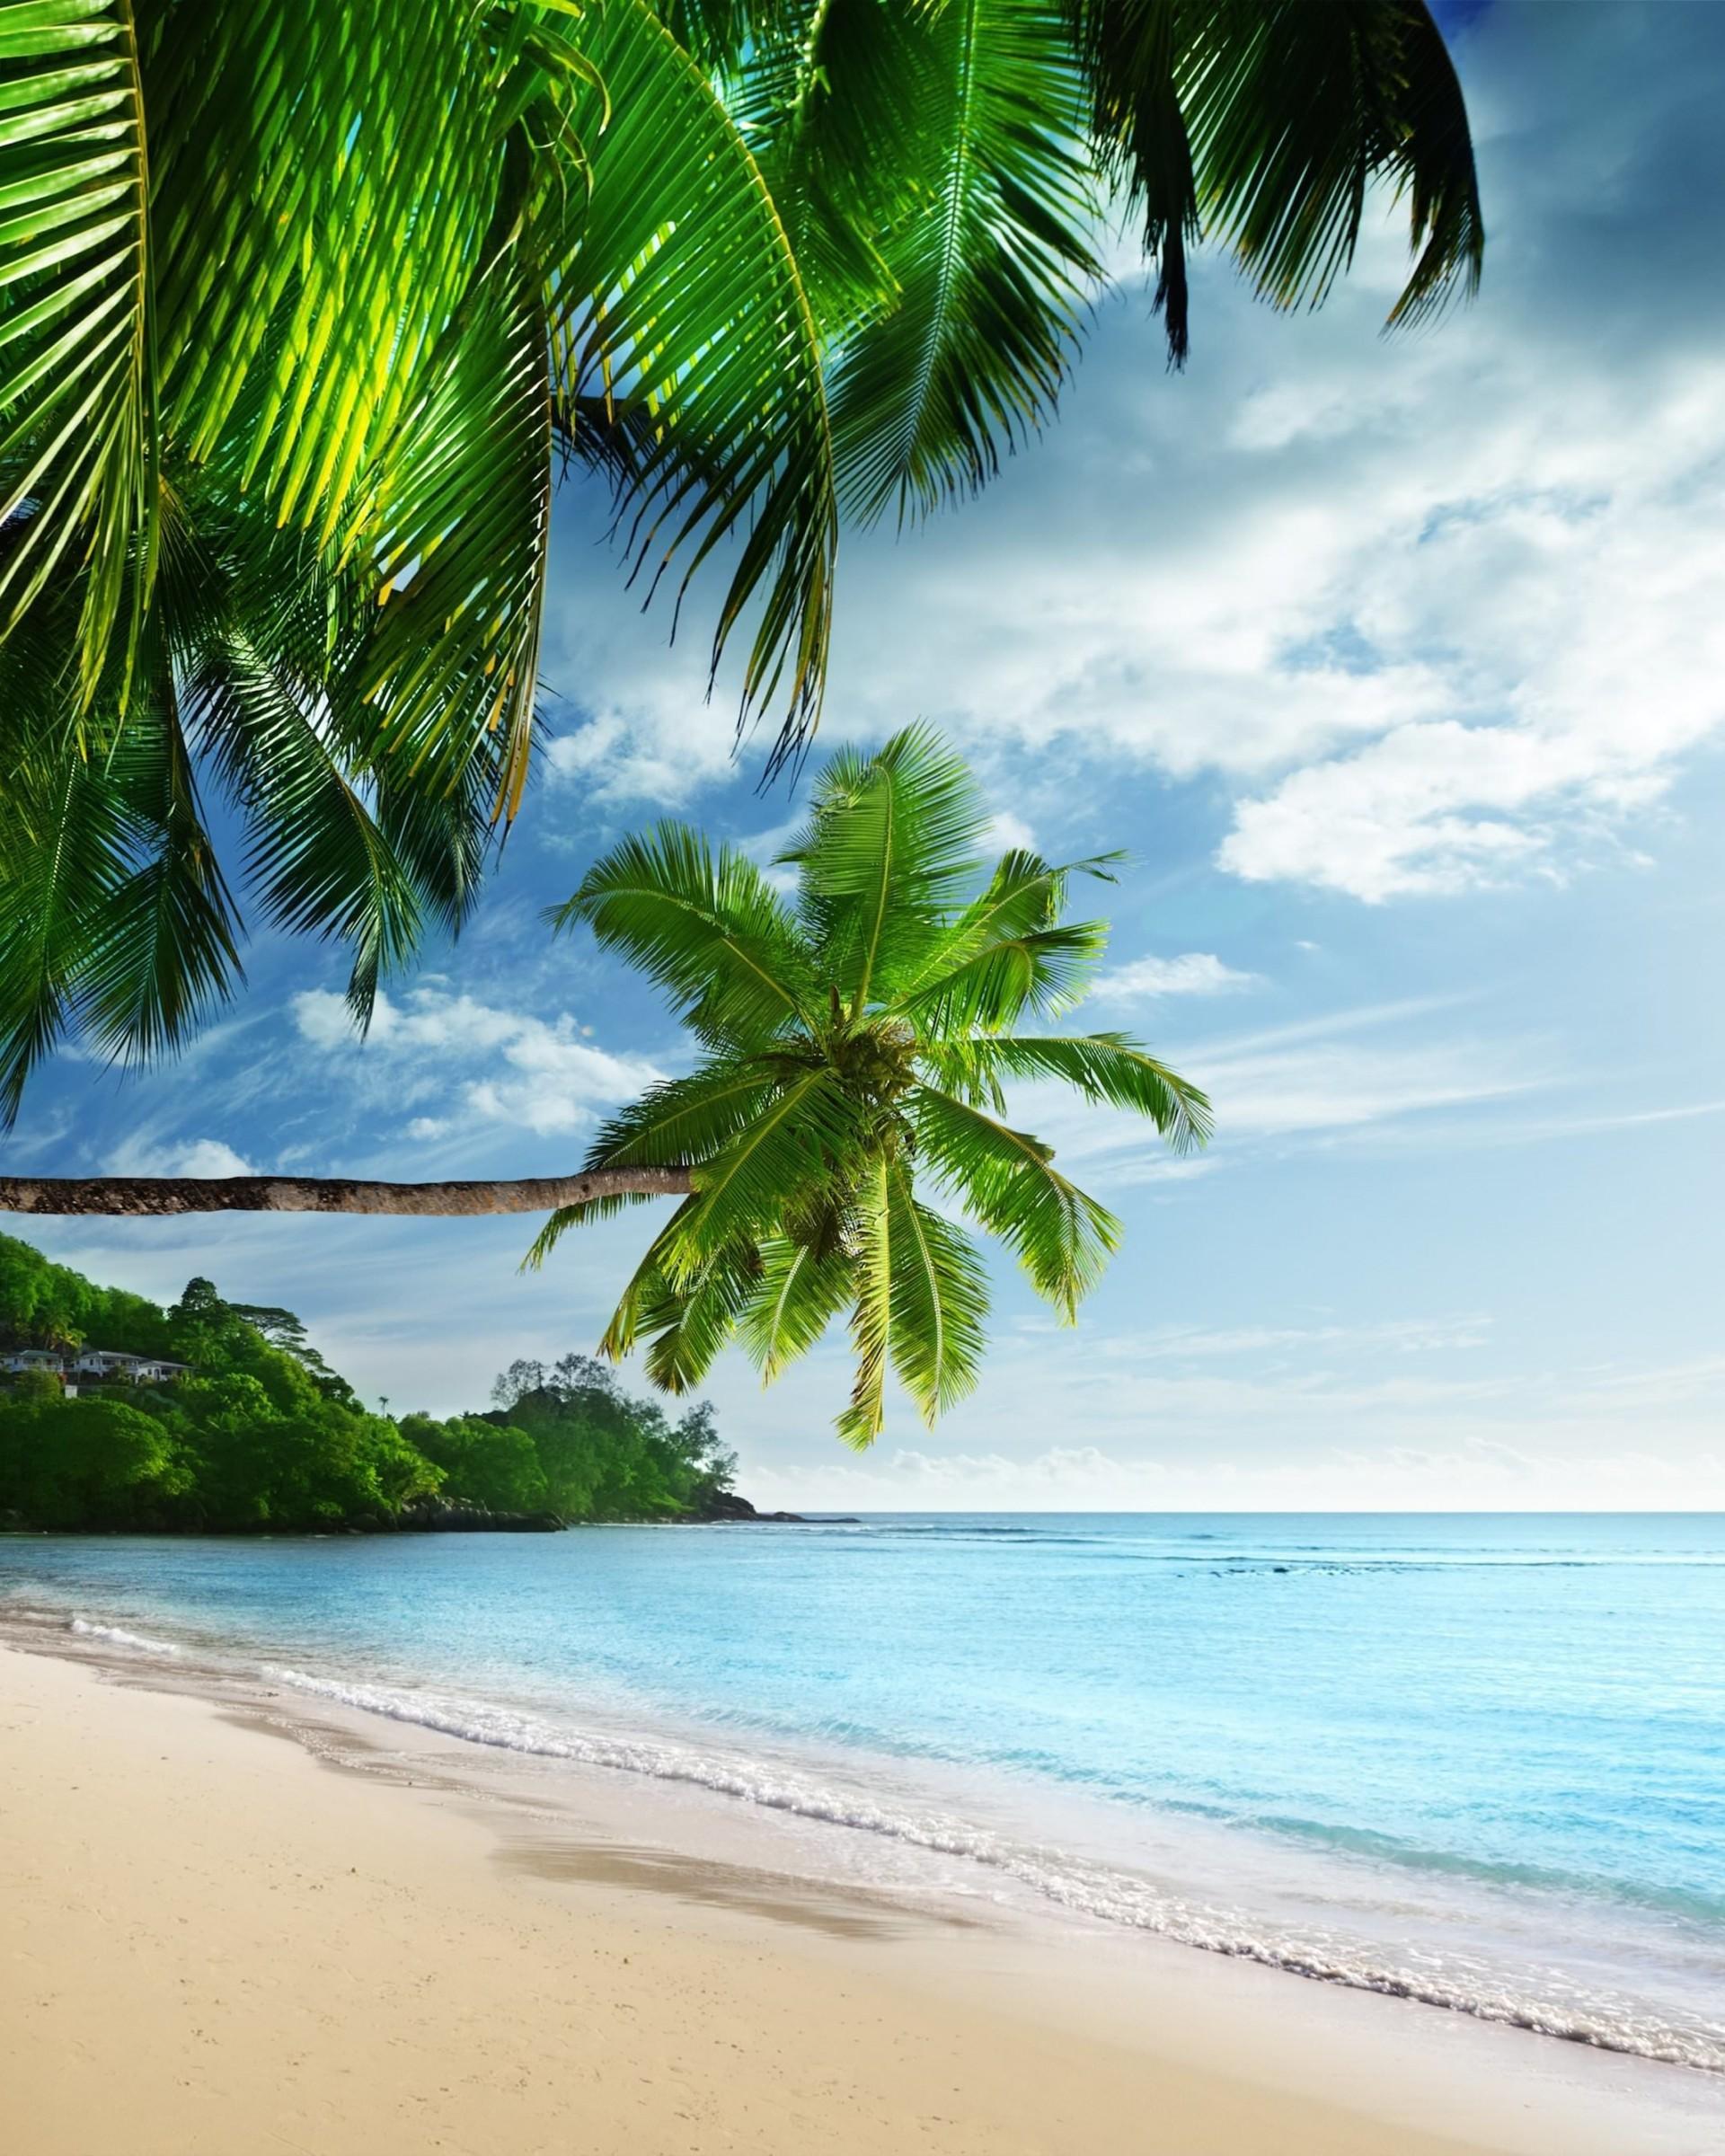 Tropical Paradise Beach HD Wallpaper For Nexus 7 Screens